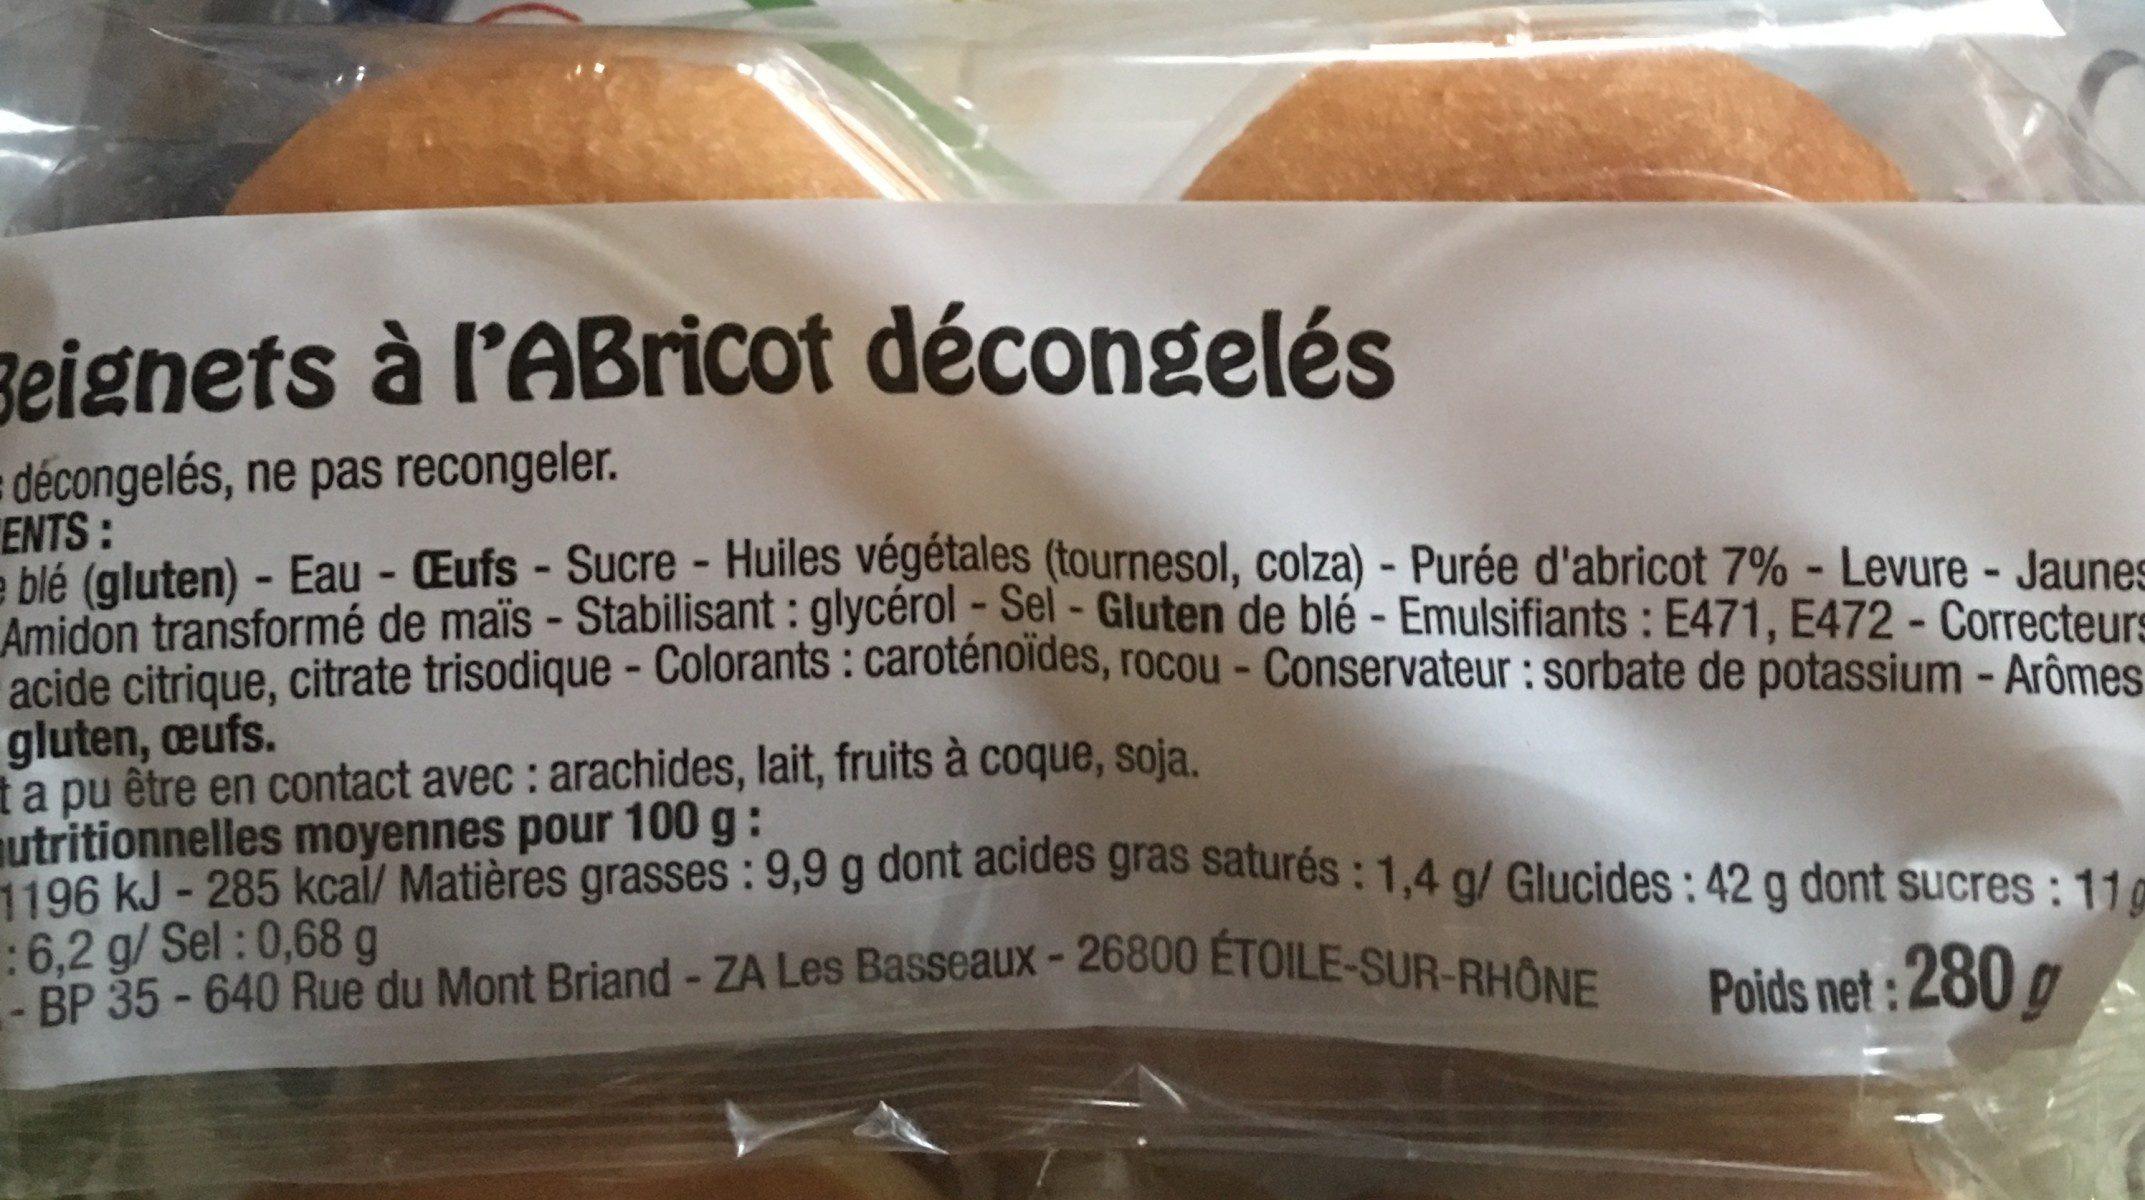 Beignets a l'abricot - Ingredients - fr